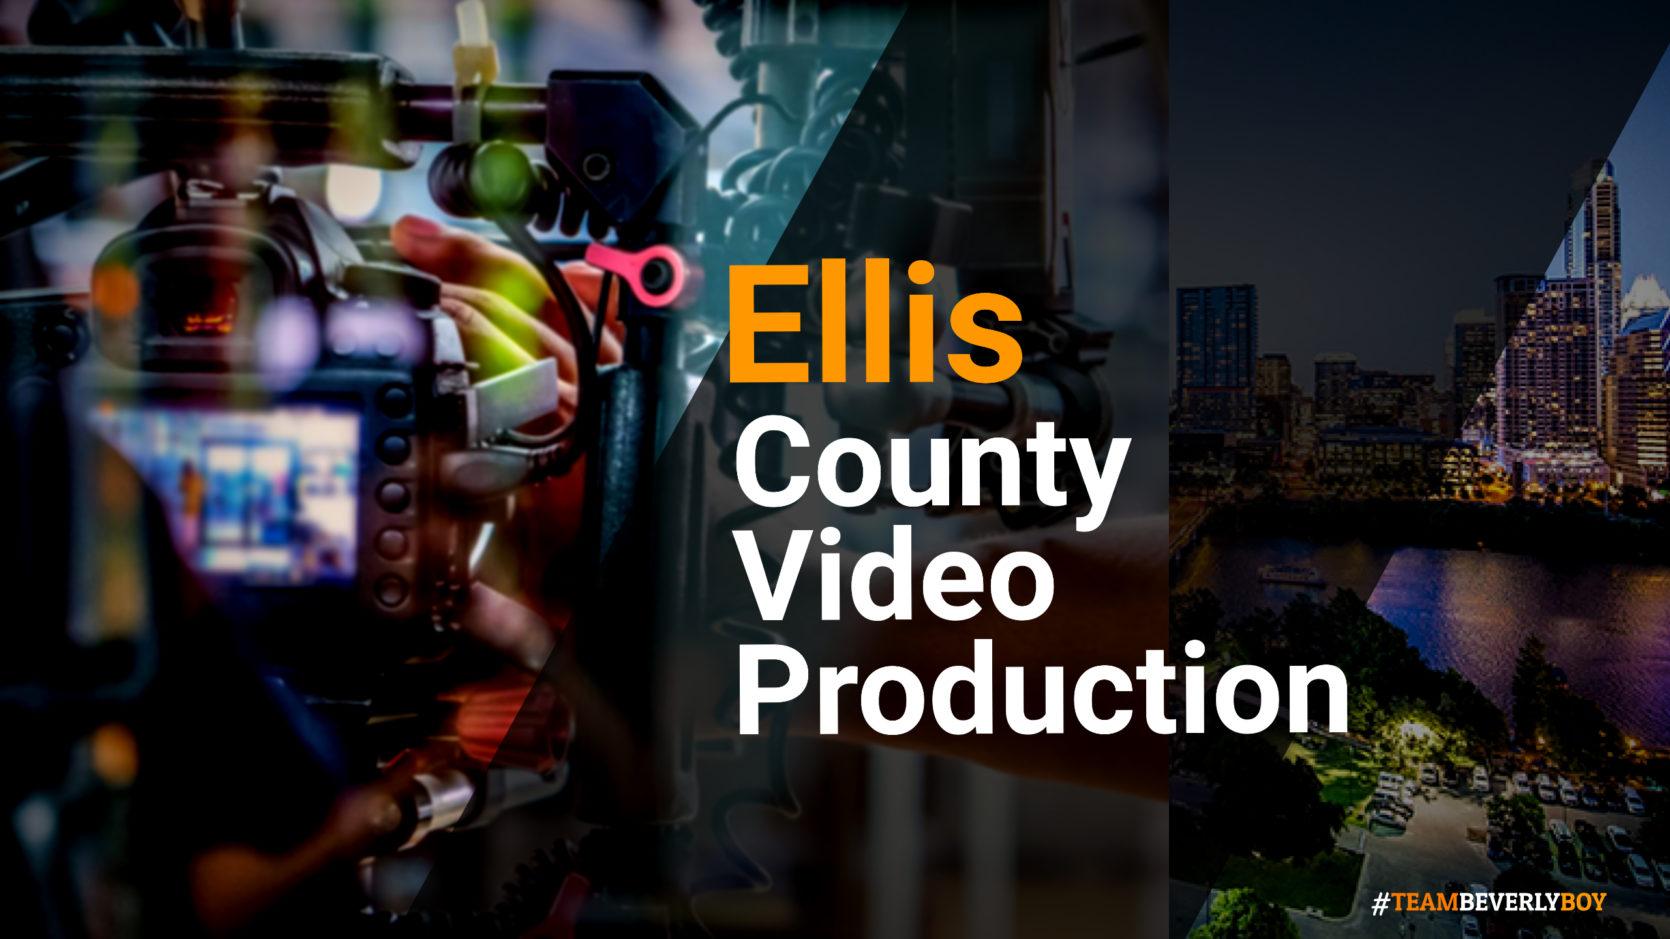 Ellis County Video Production